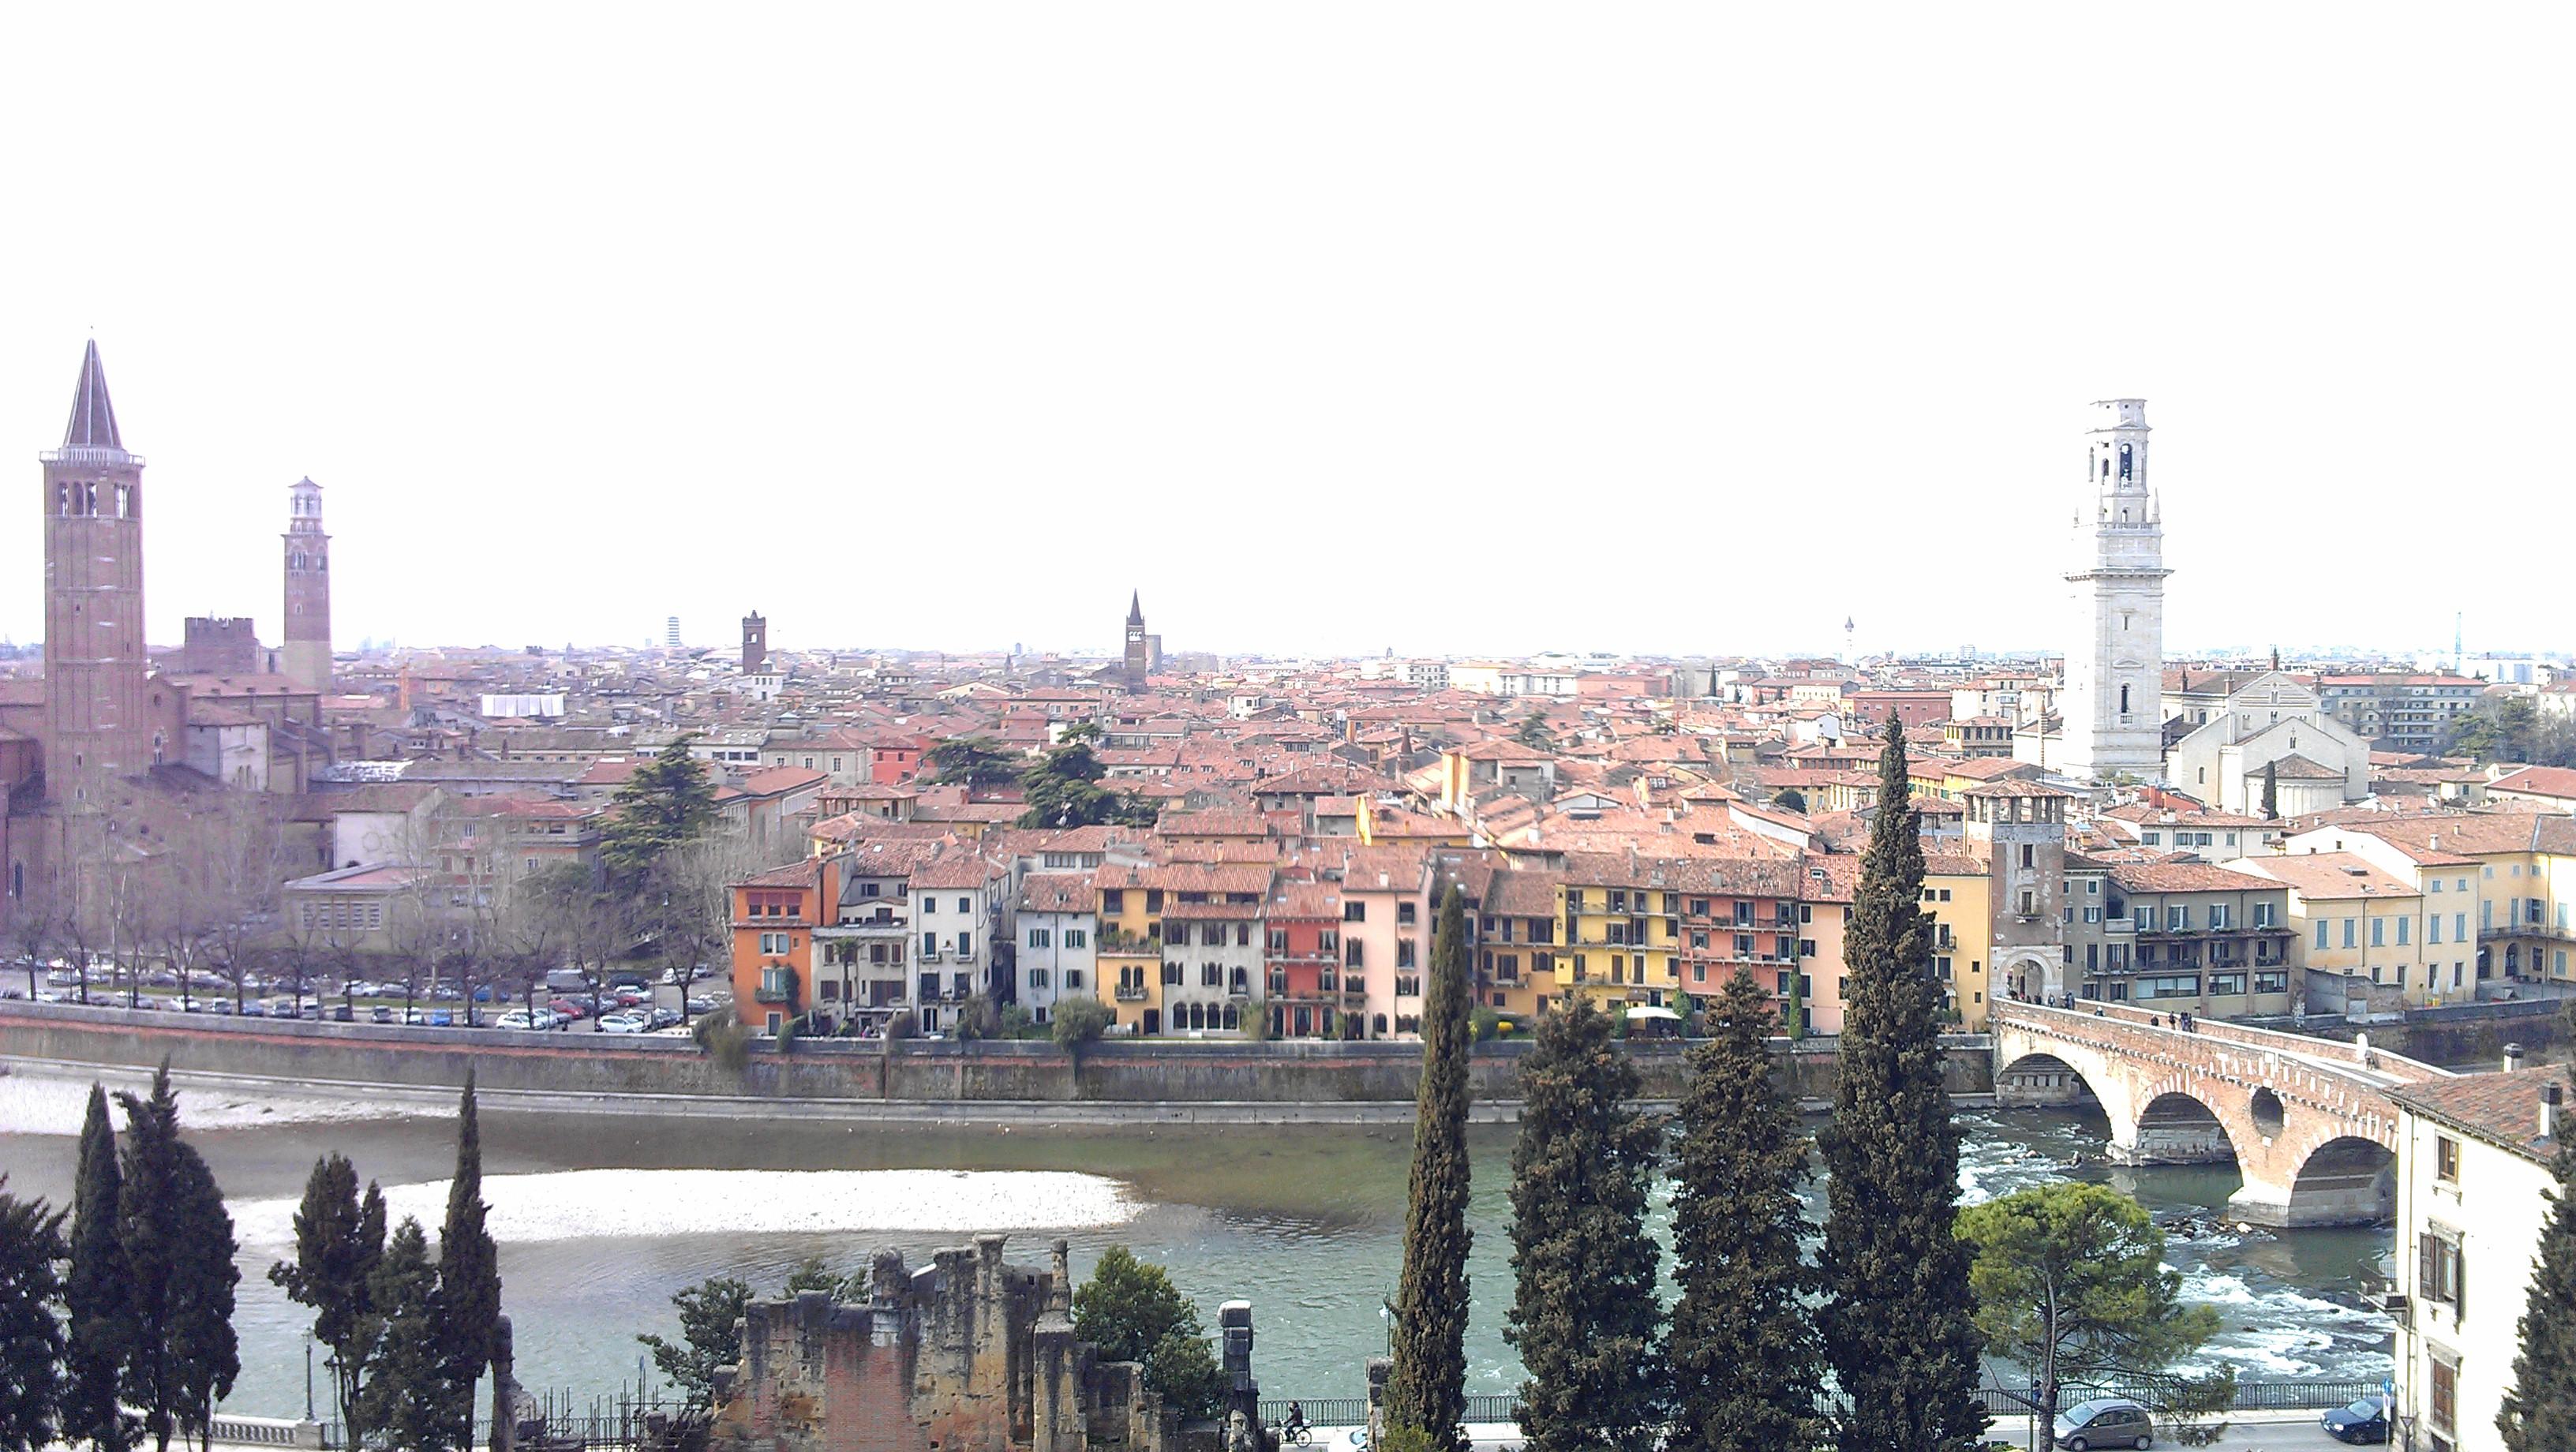 Santa anastasia and the duomo basilicas